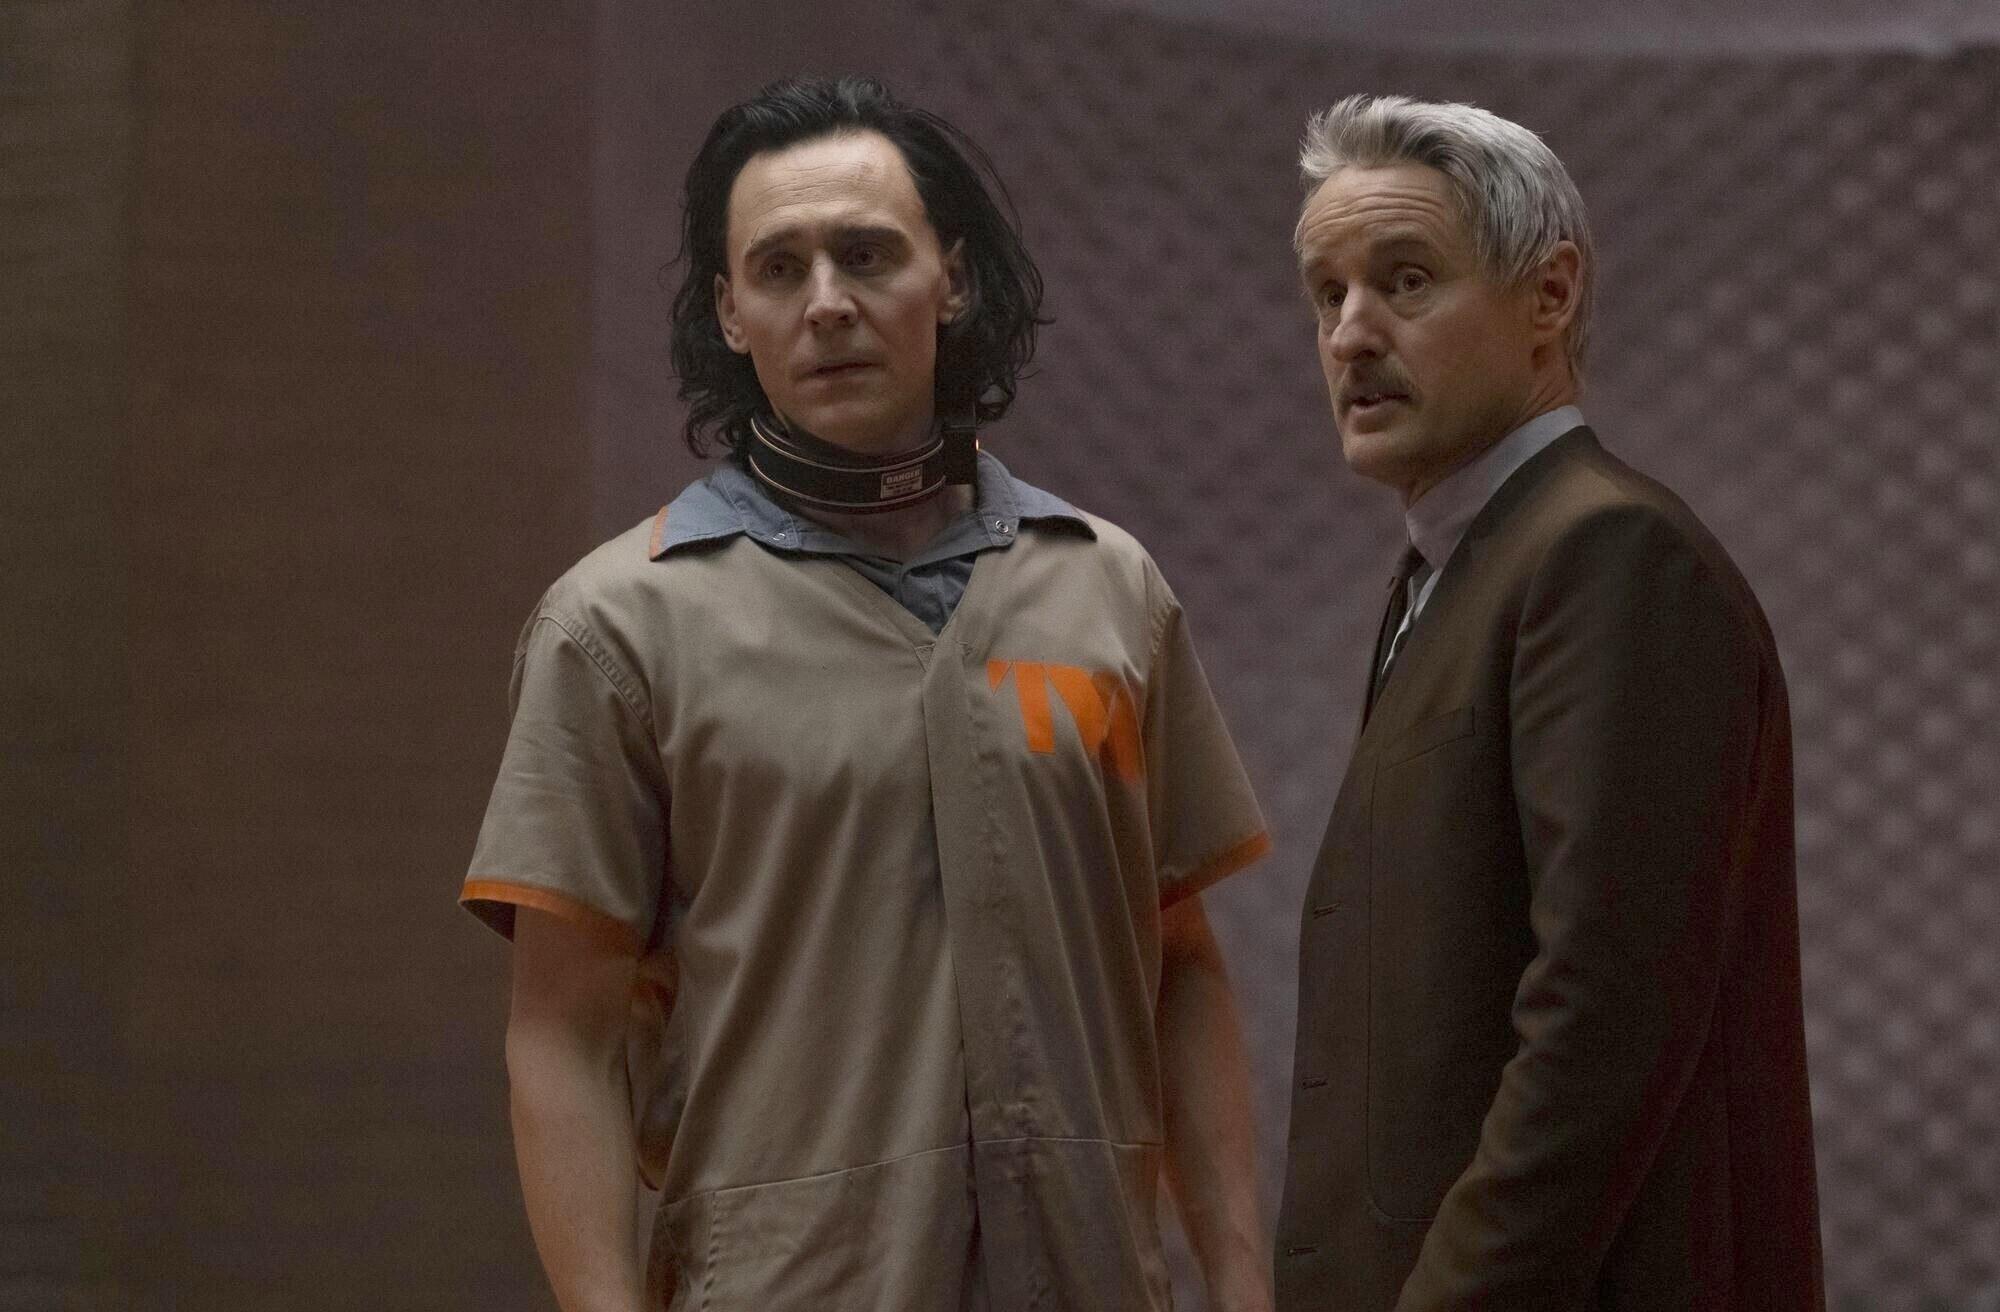 Tom Hiddleston and Owen Wilson stand inside a prison